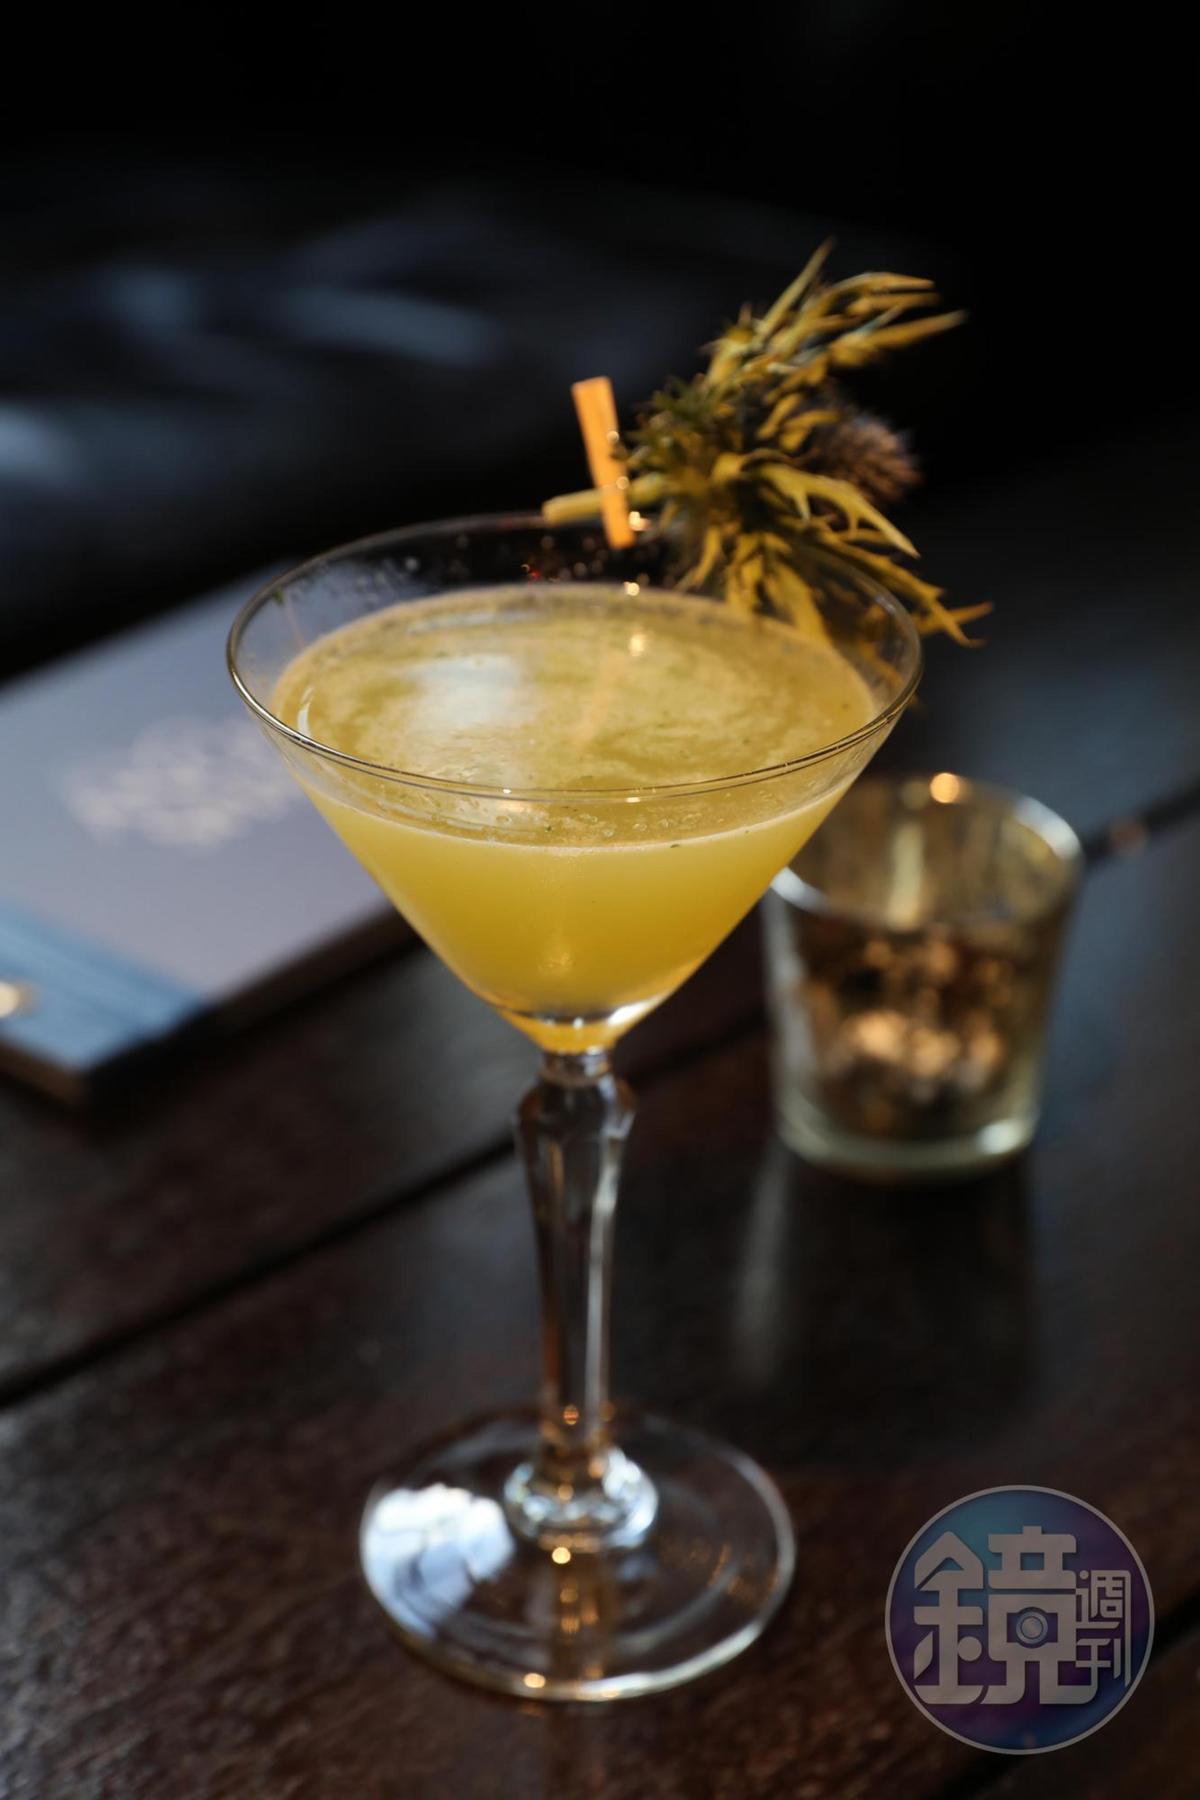 「Skye Storm」以蘇格蘭北方天空島為名的雞尾酒,是威士忌、檸檬汁、草莓糖漿與胡椒子的組合。(9英鎊/杯,約NT$364)